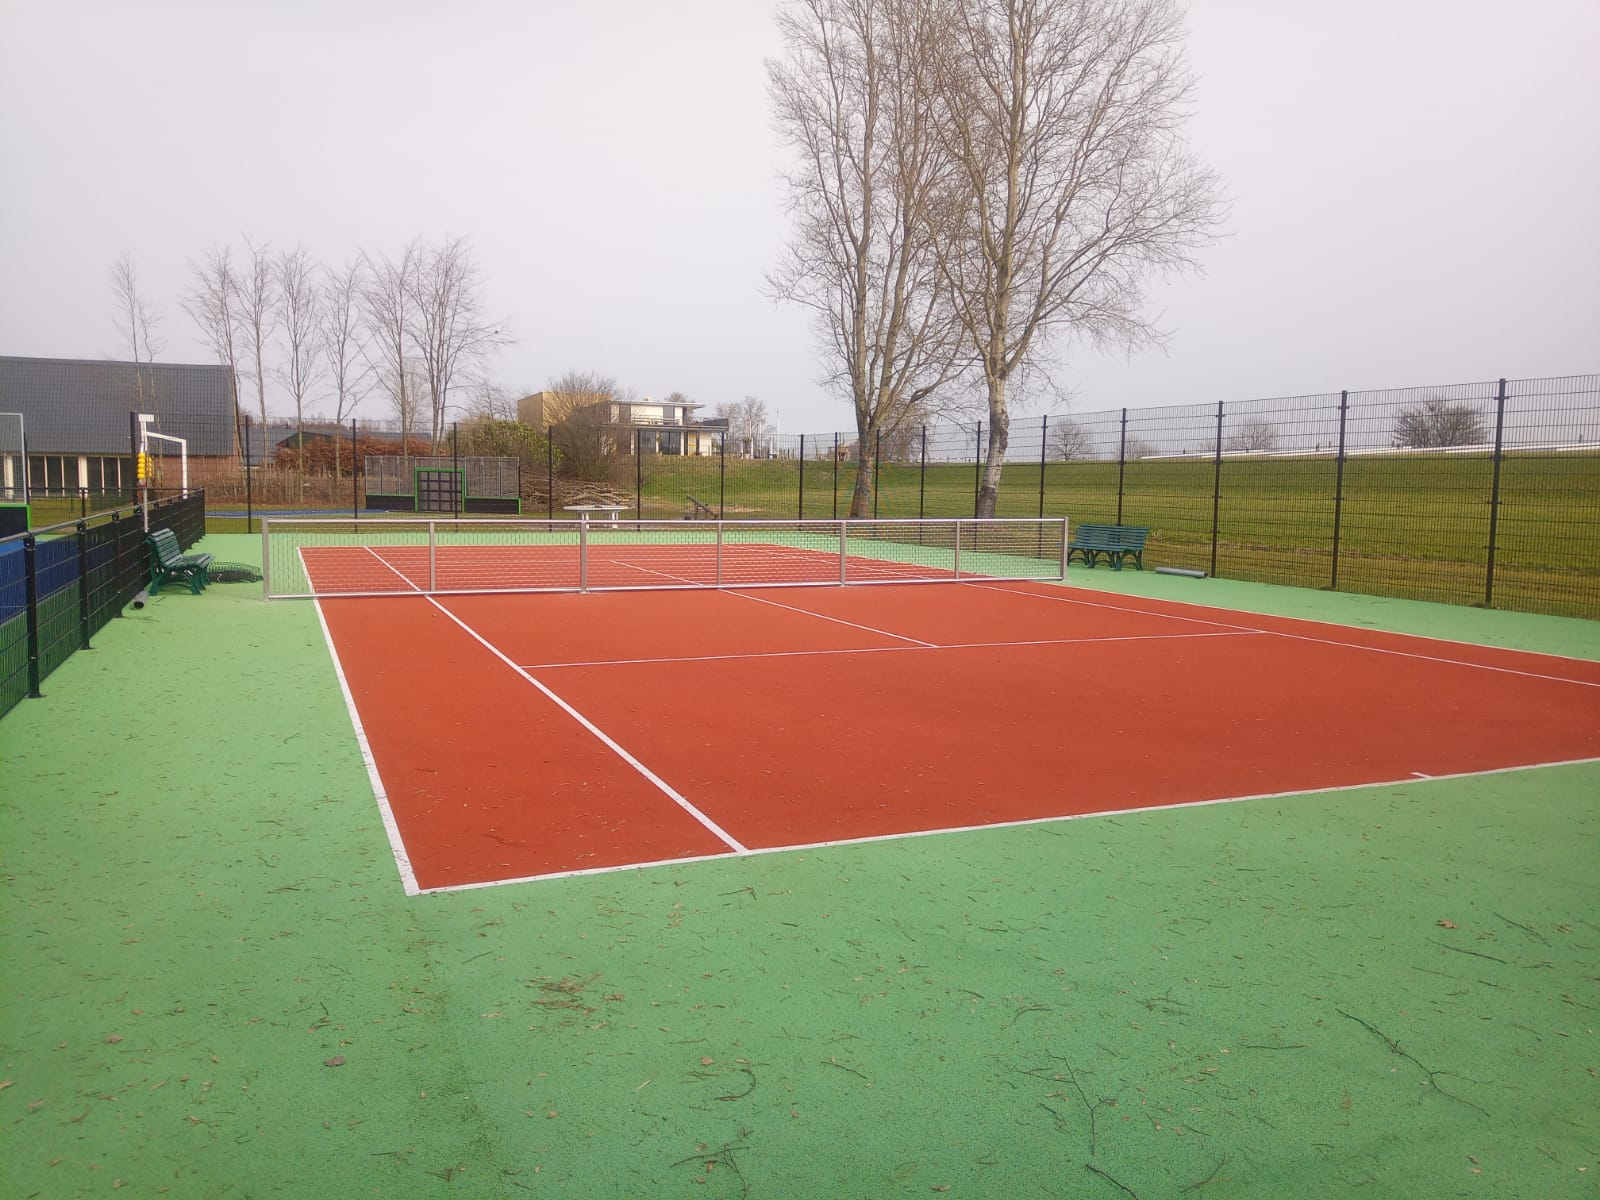 hufterproof-tennisnet-rvs